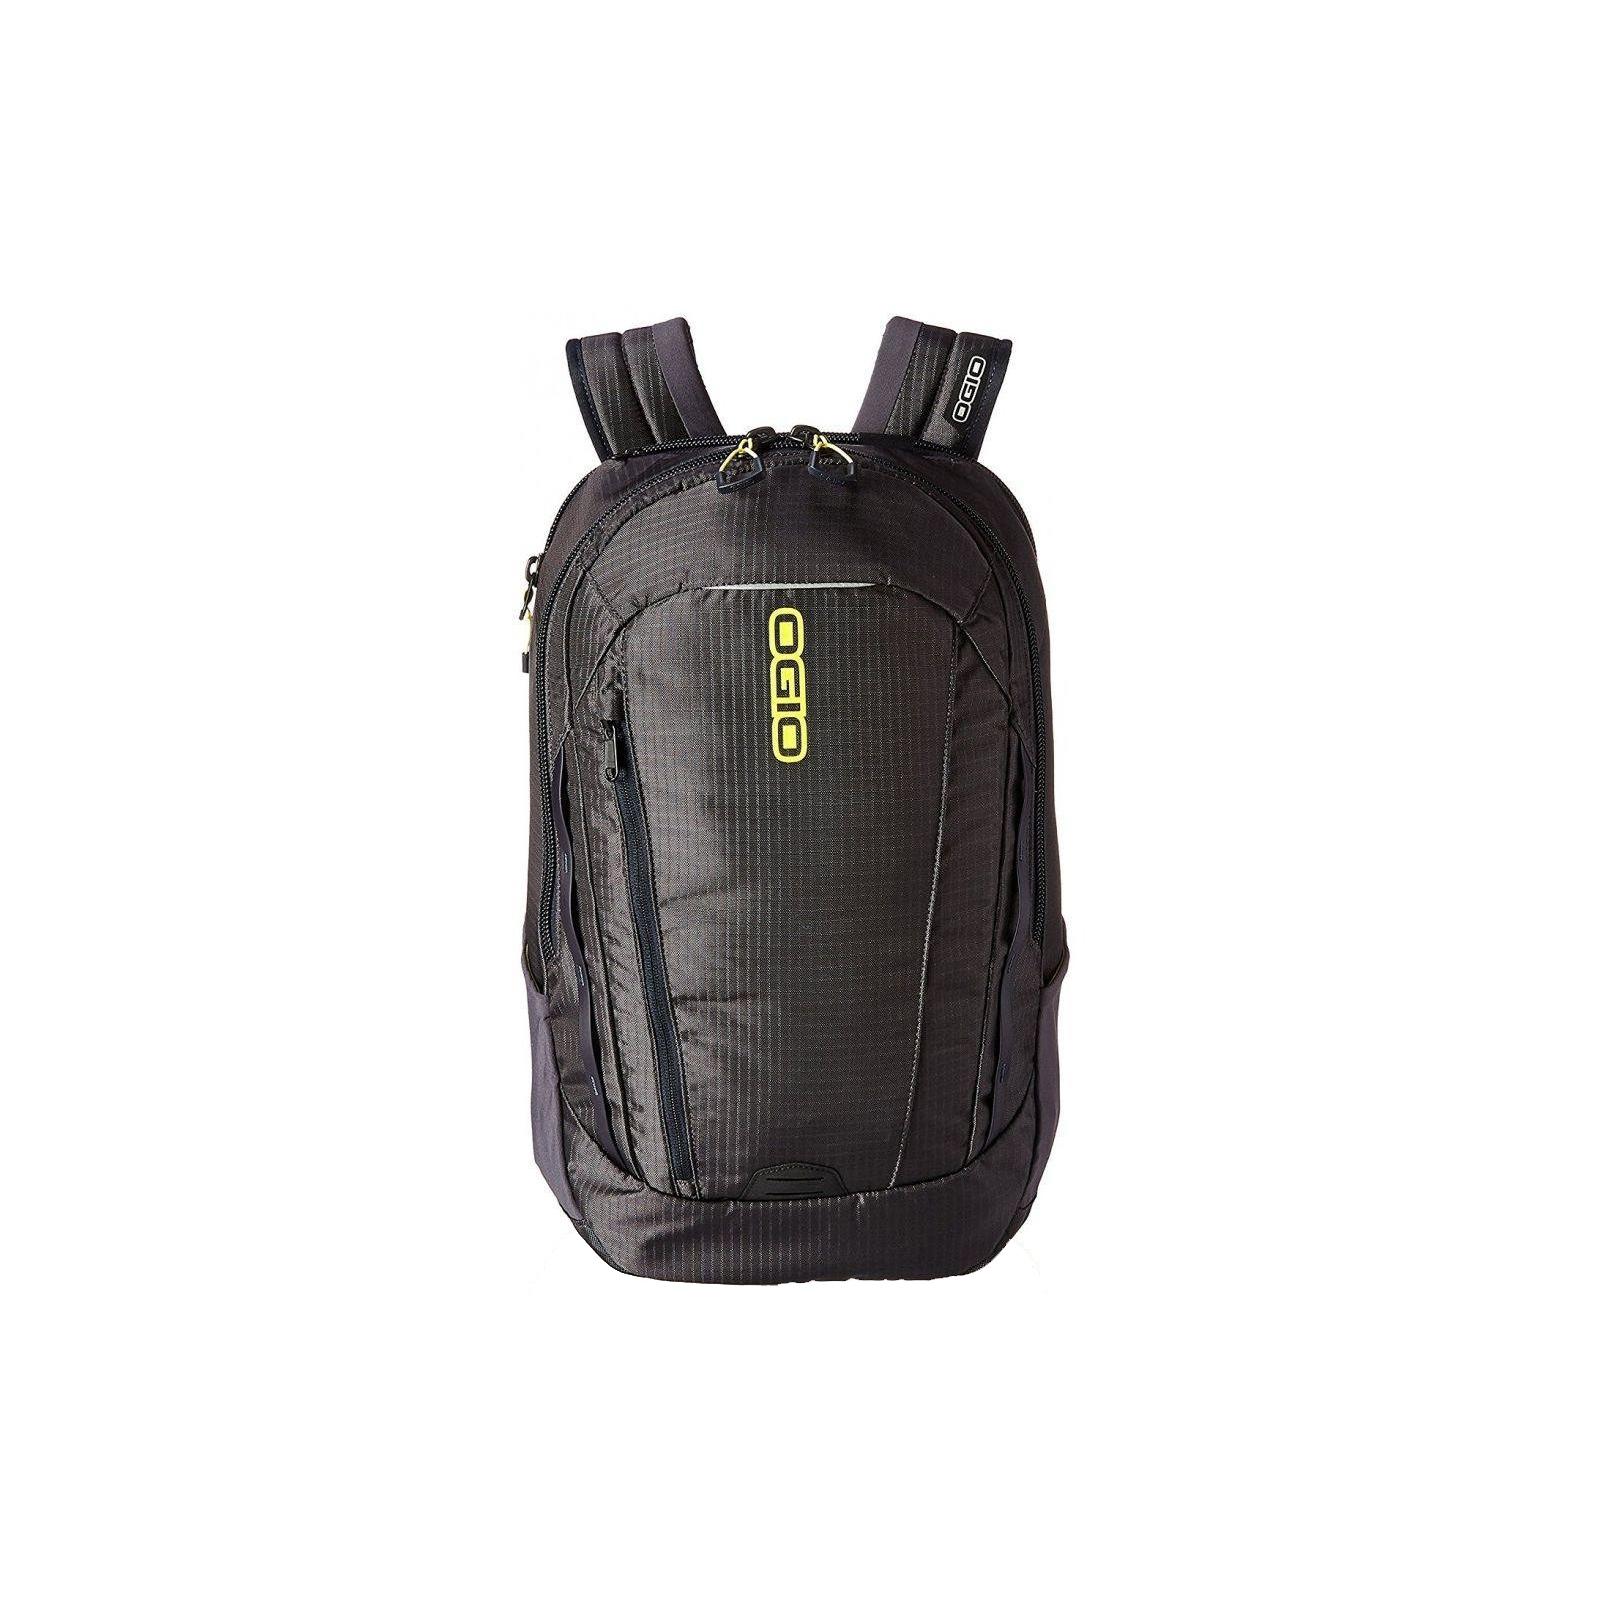 "Рюкзак для ноутбука Ogio 15.6"" APOLLO Pack, Black/Acid (111106.248)"